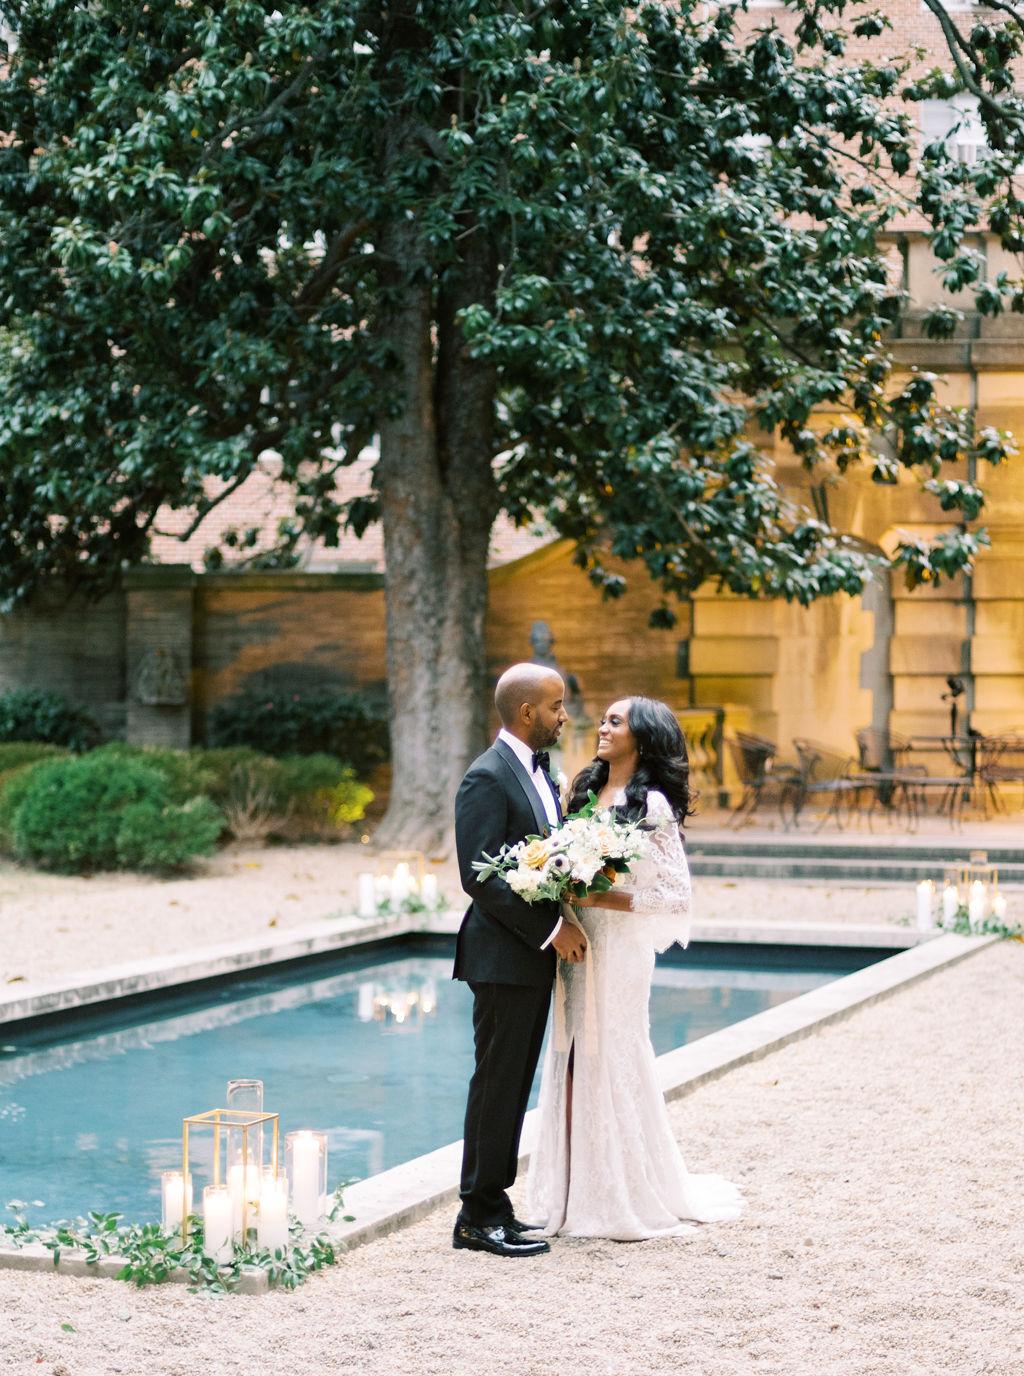 megan henock wedding couple portrait by pool